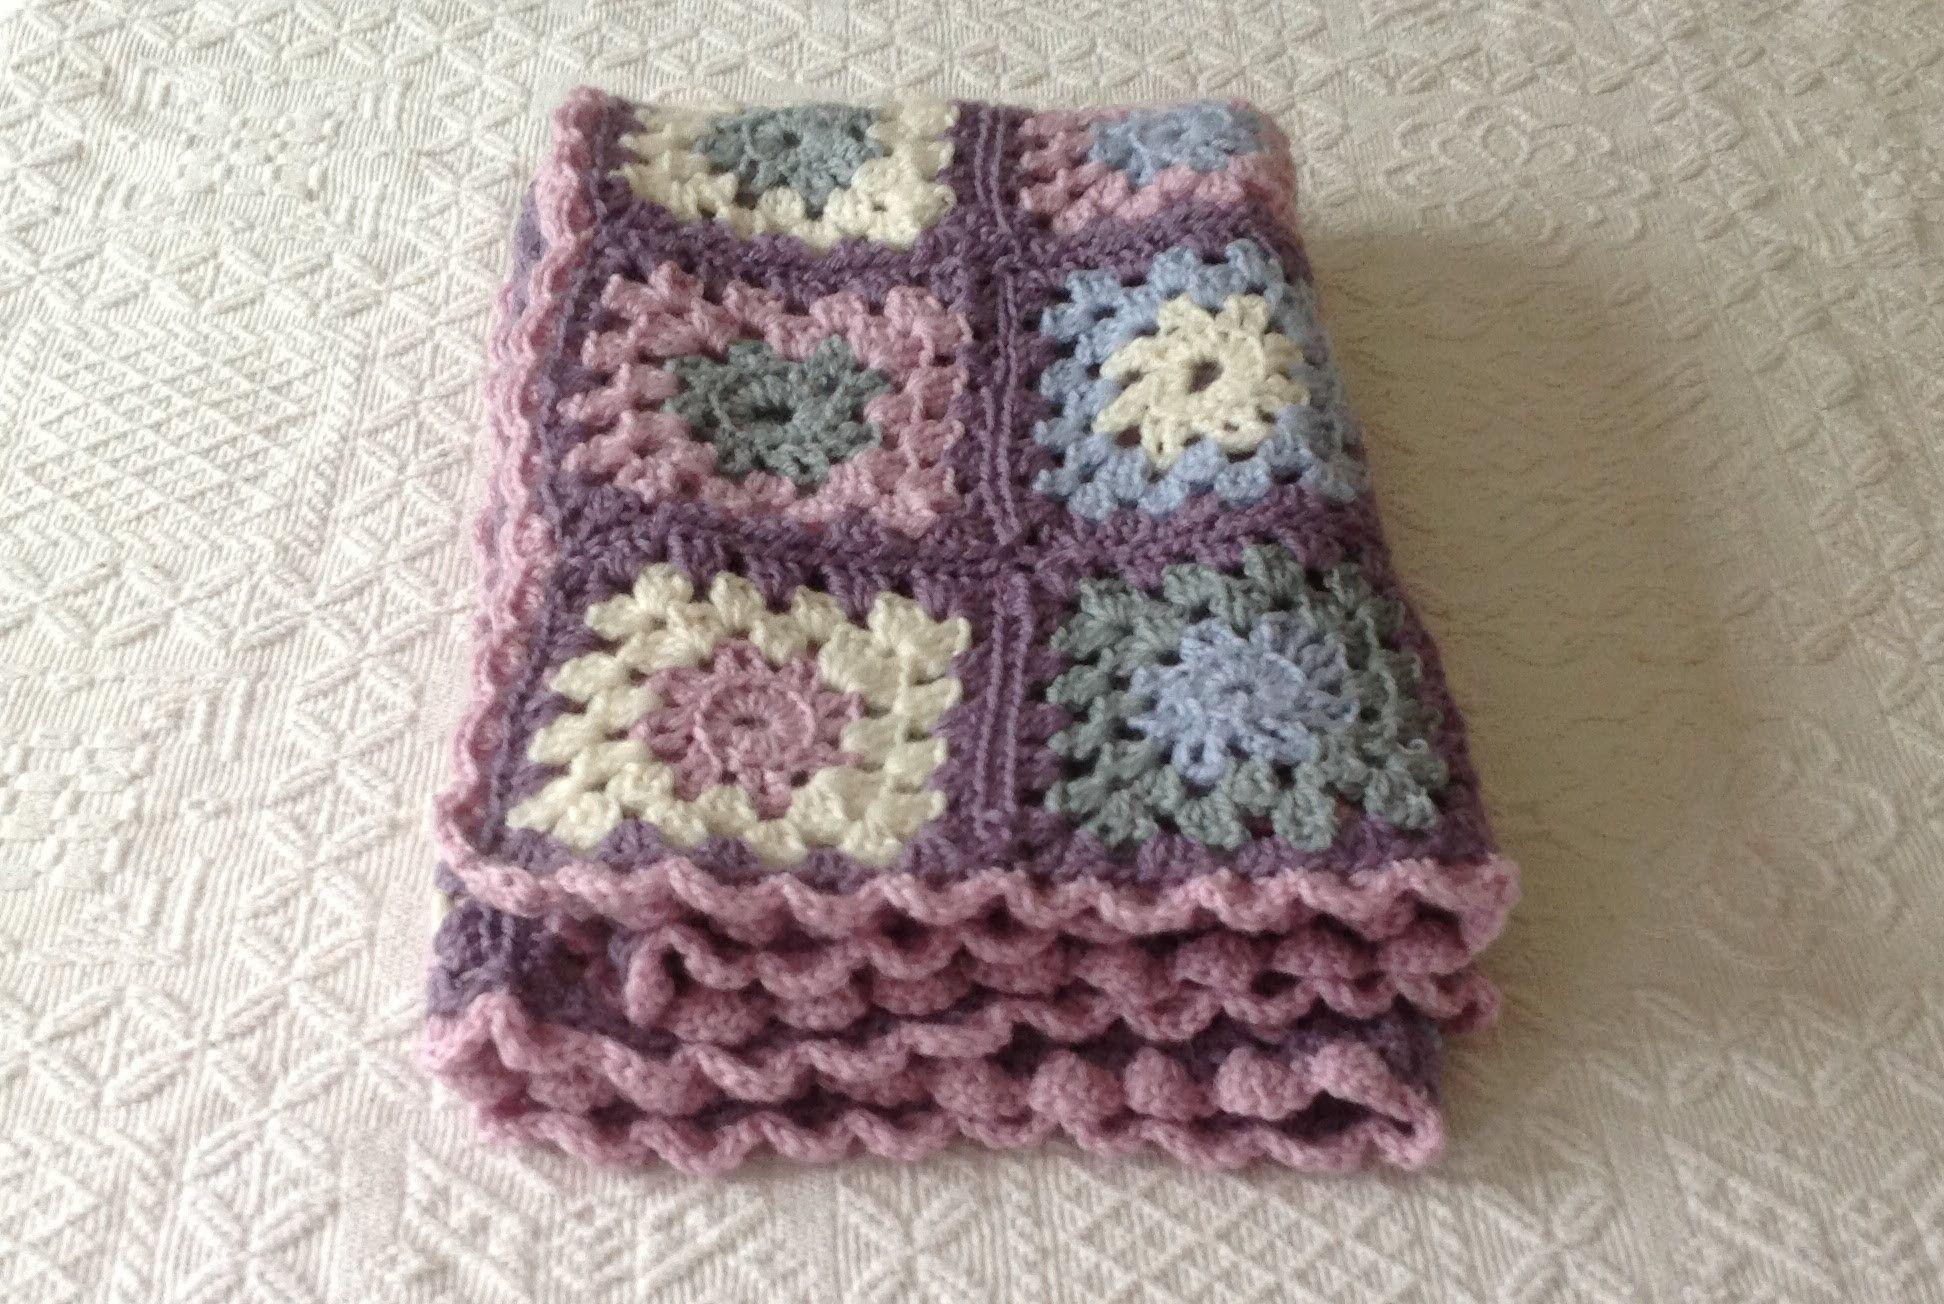 VERY EASY granny square blanket tutorial for beginners